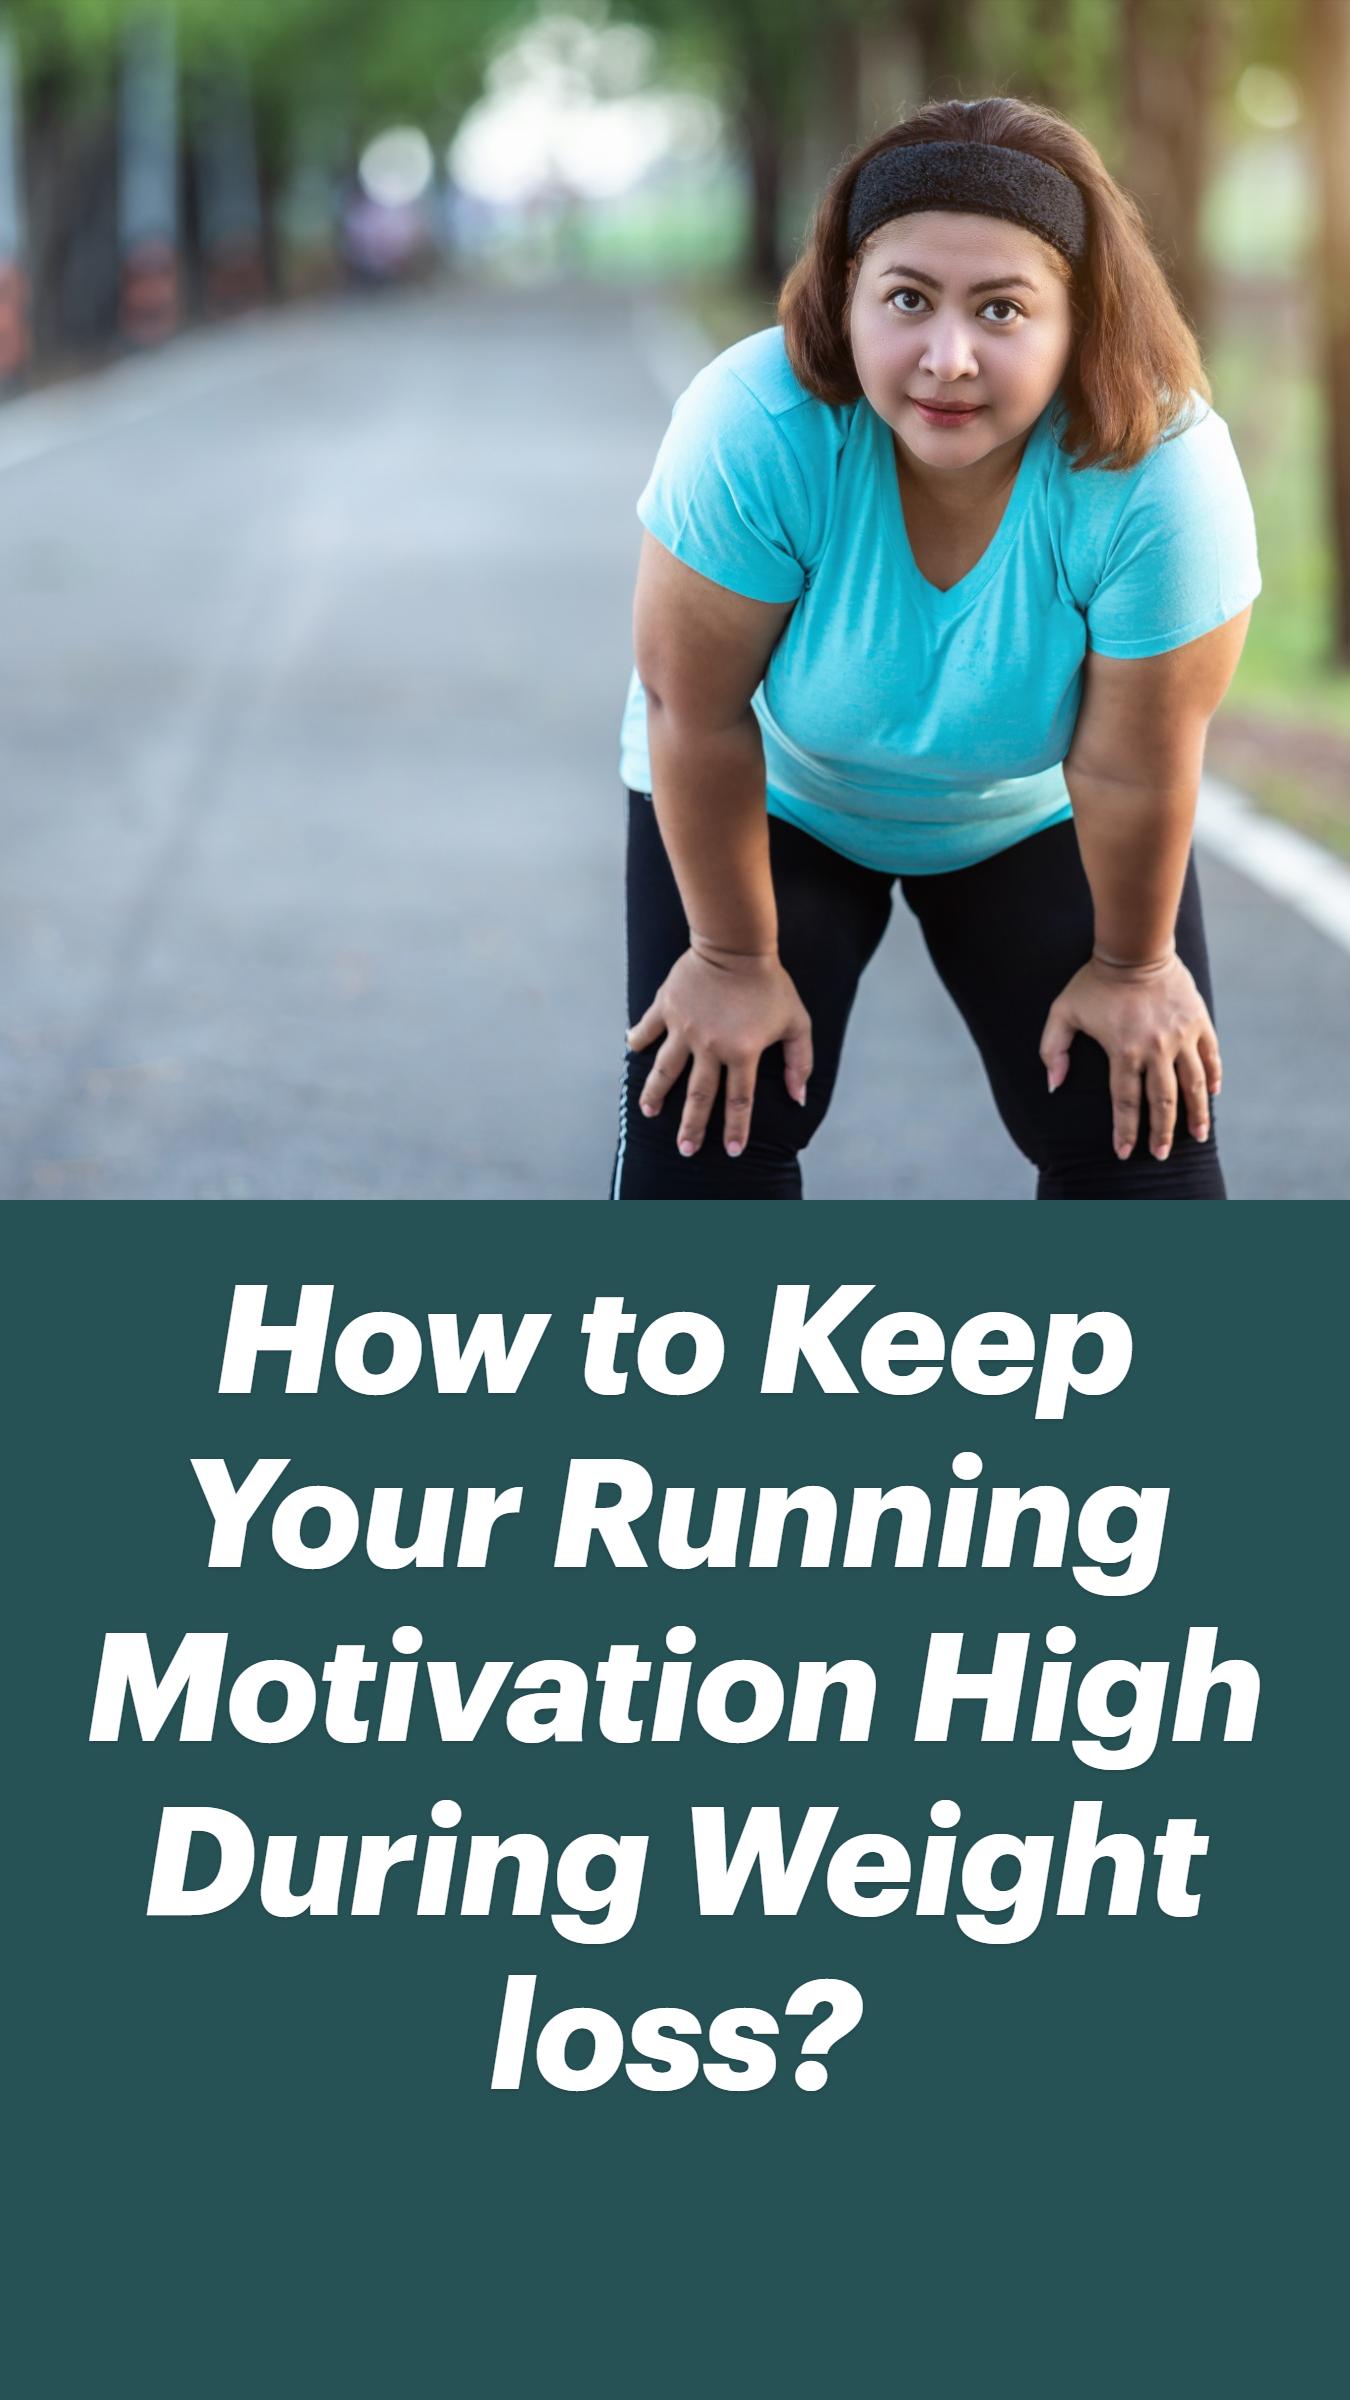 Running Motivation During Weight Loss